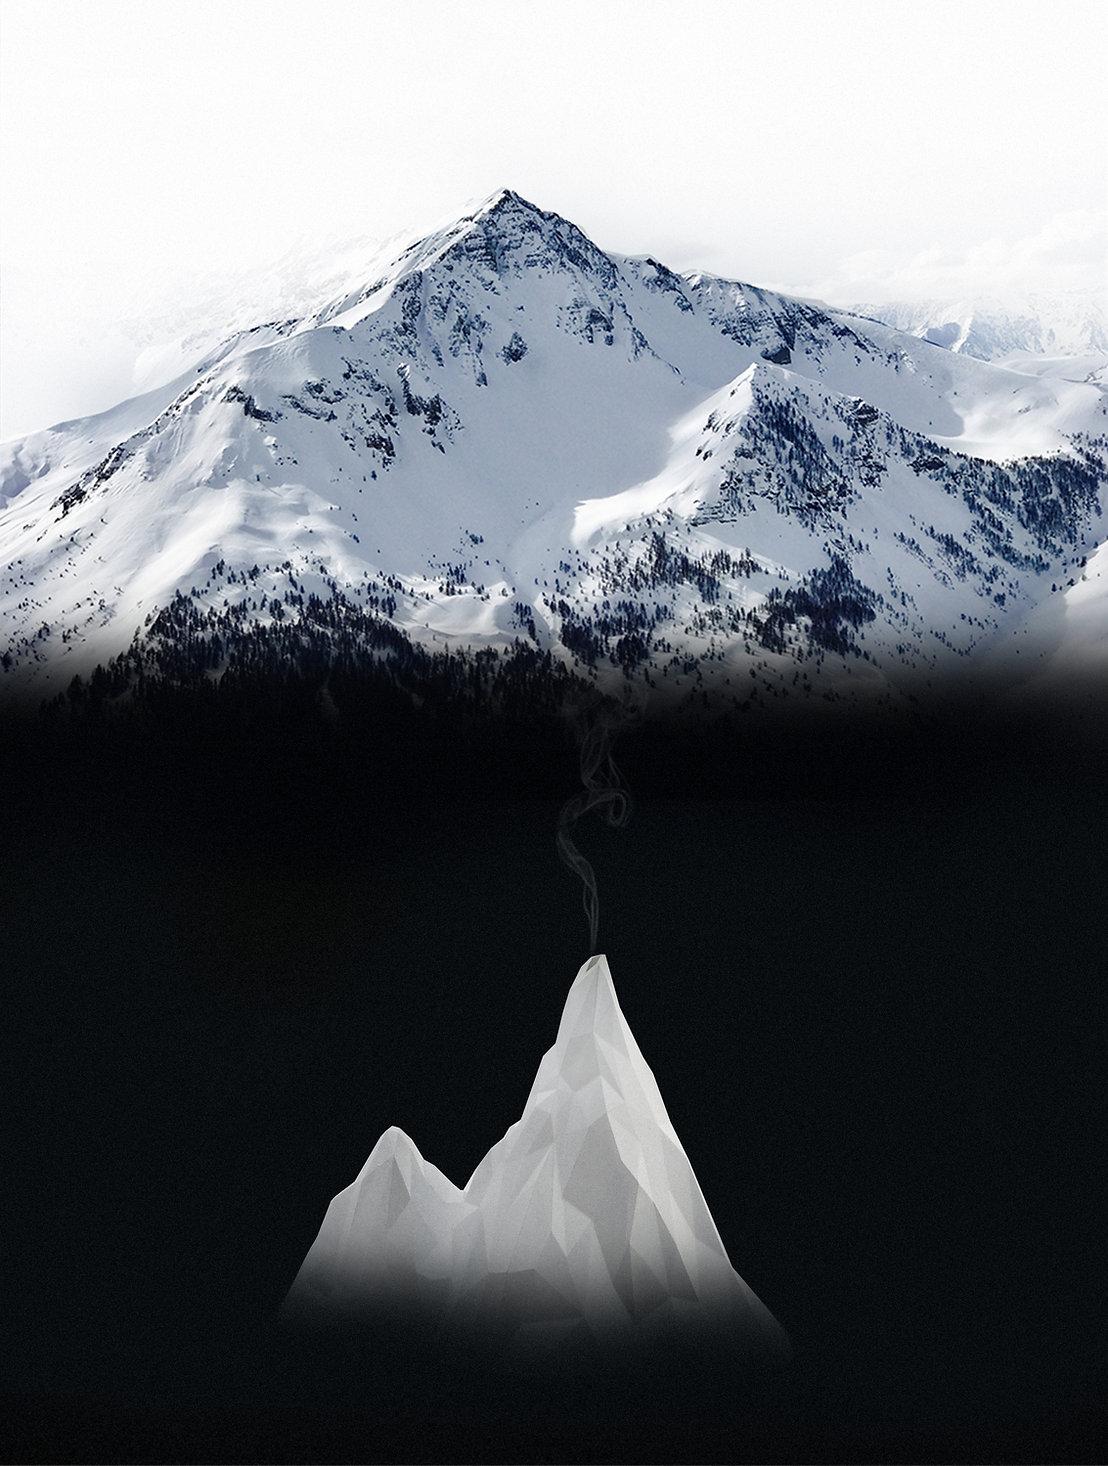 180104-aroma mountain - (가로&세로)11.jpg